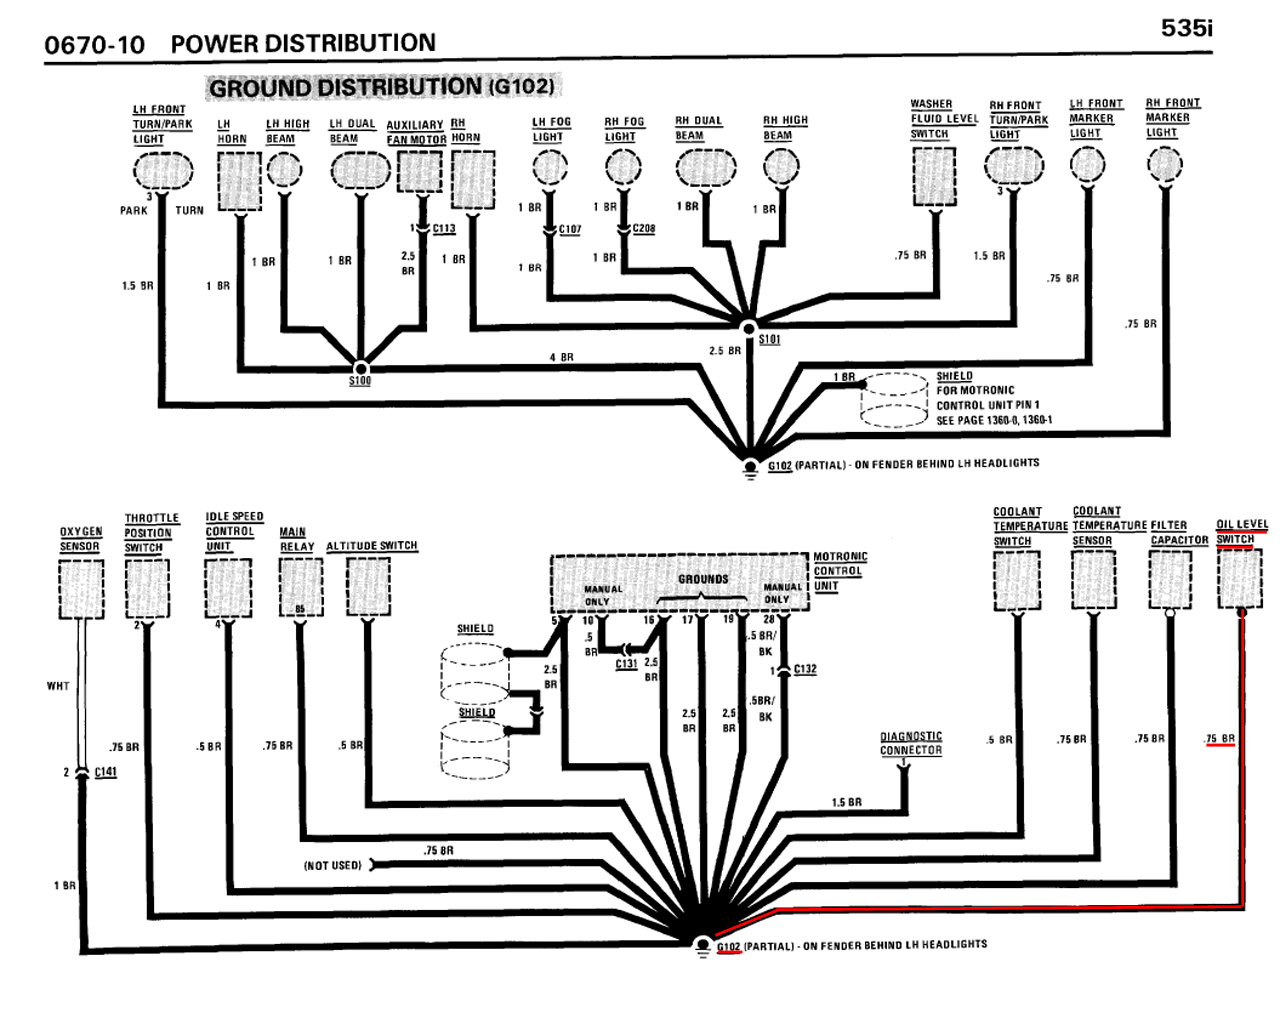 air flow meter wiring diagram miller tig welder foot pedal bmw m30 engine for sale free image user